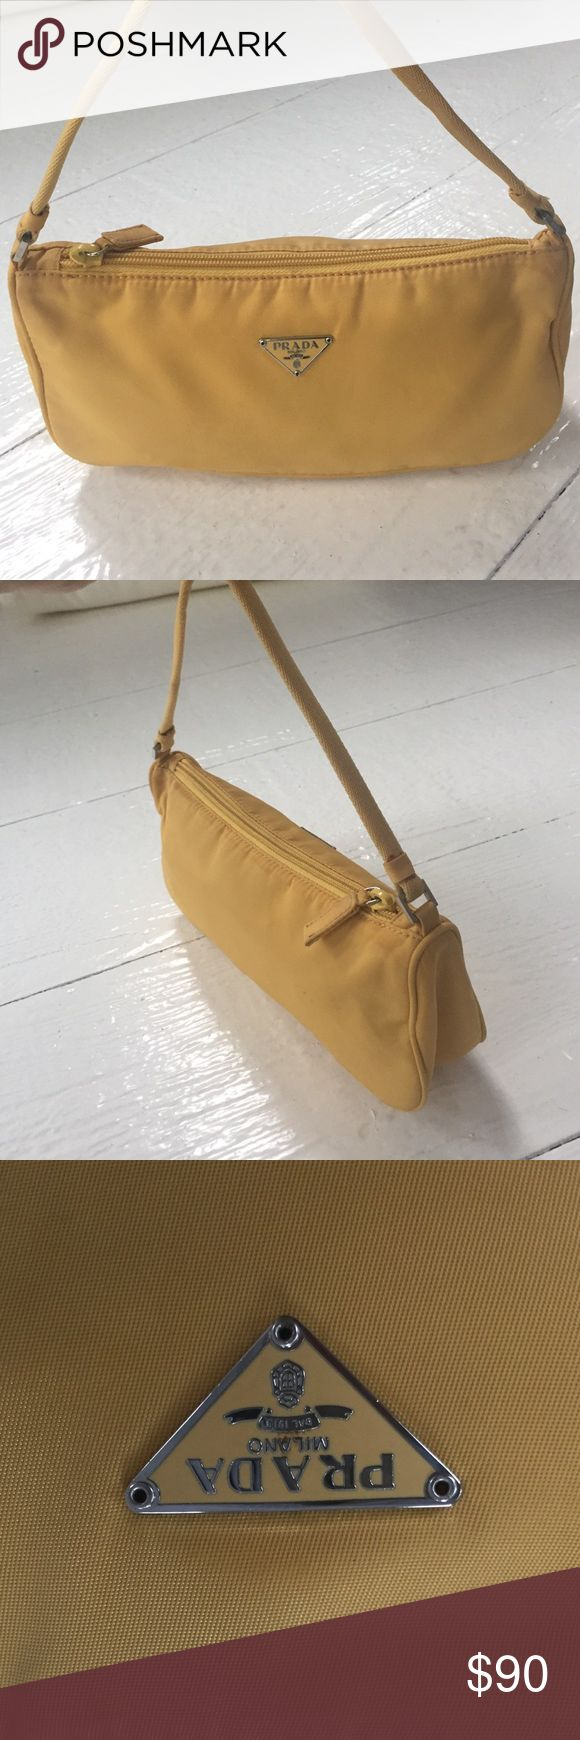 Prada handbag Small yellow Prada shoulder bag. Used. Authentic. Nylon with silver hardware. Prada Bags Shoulder Bags